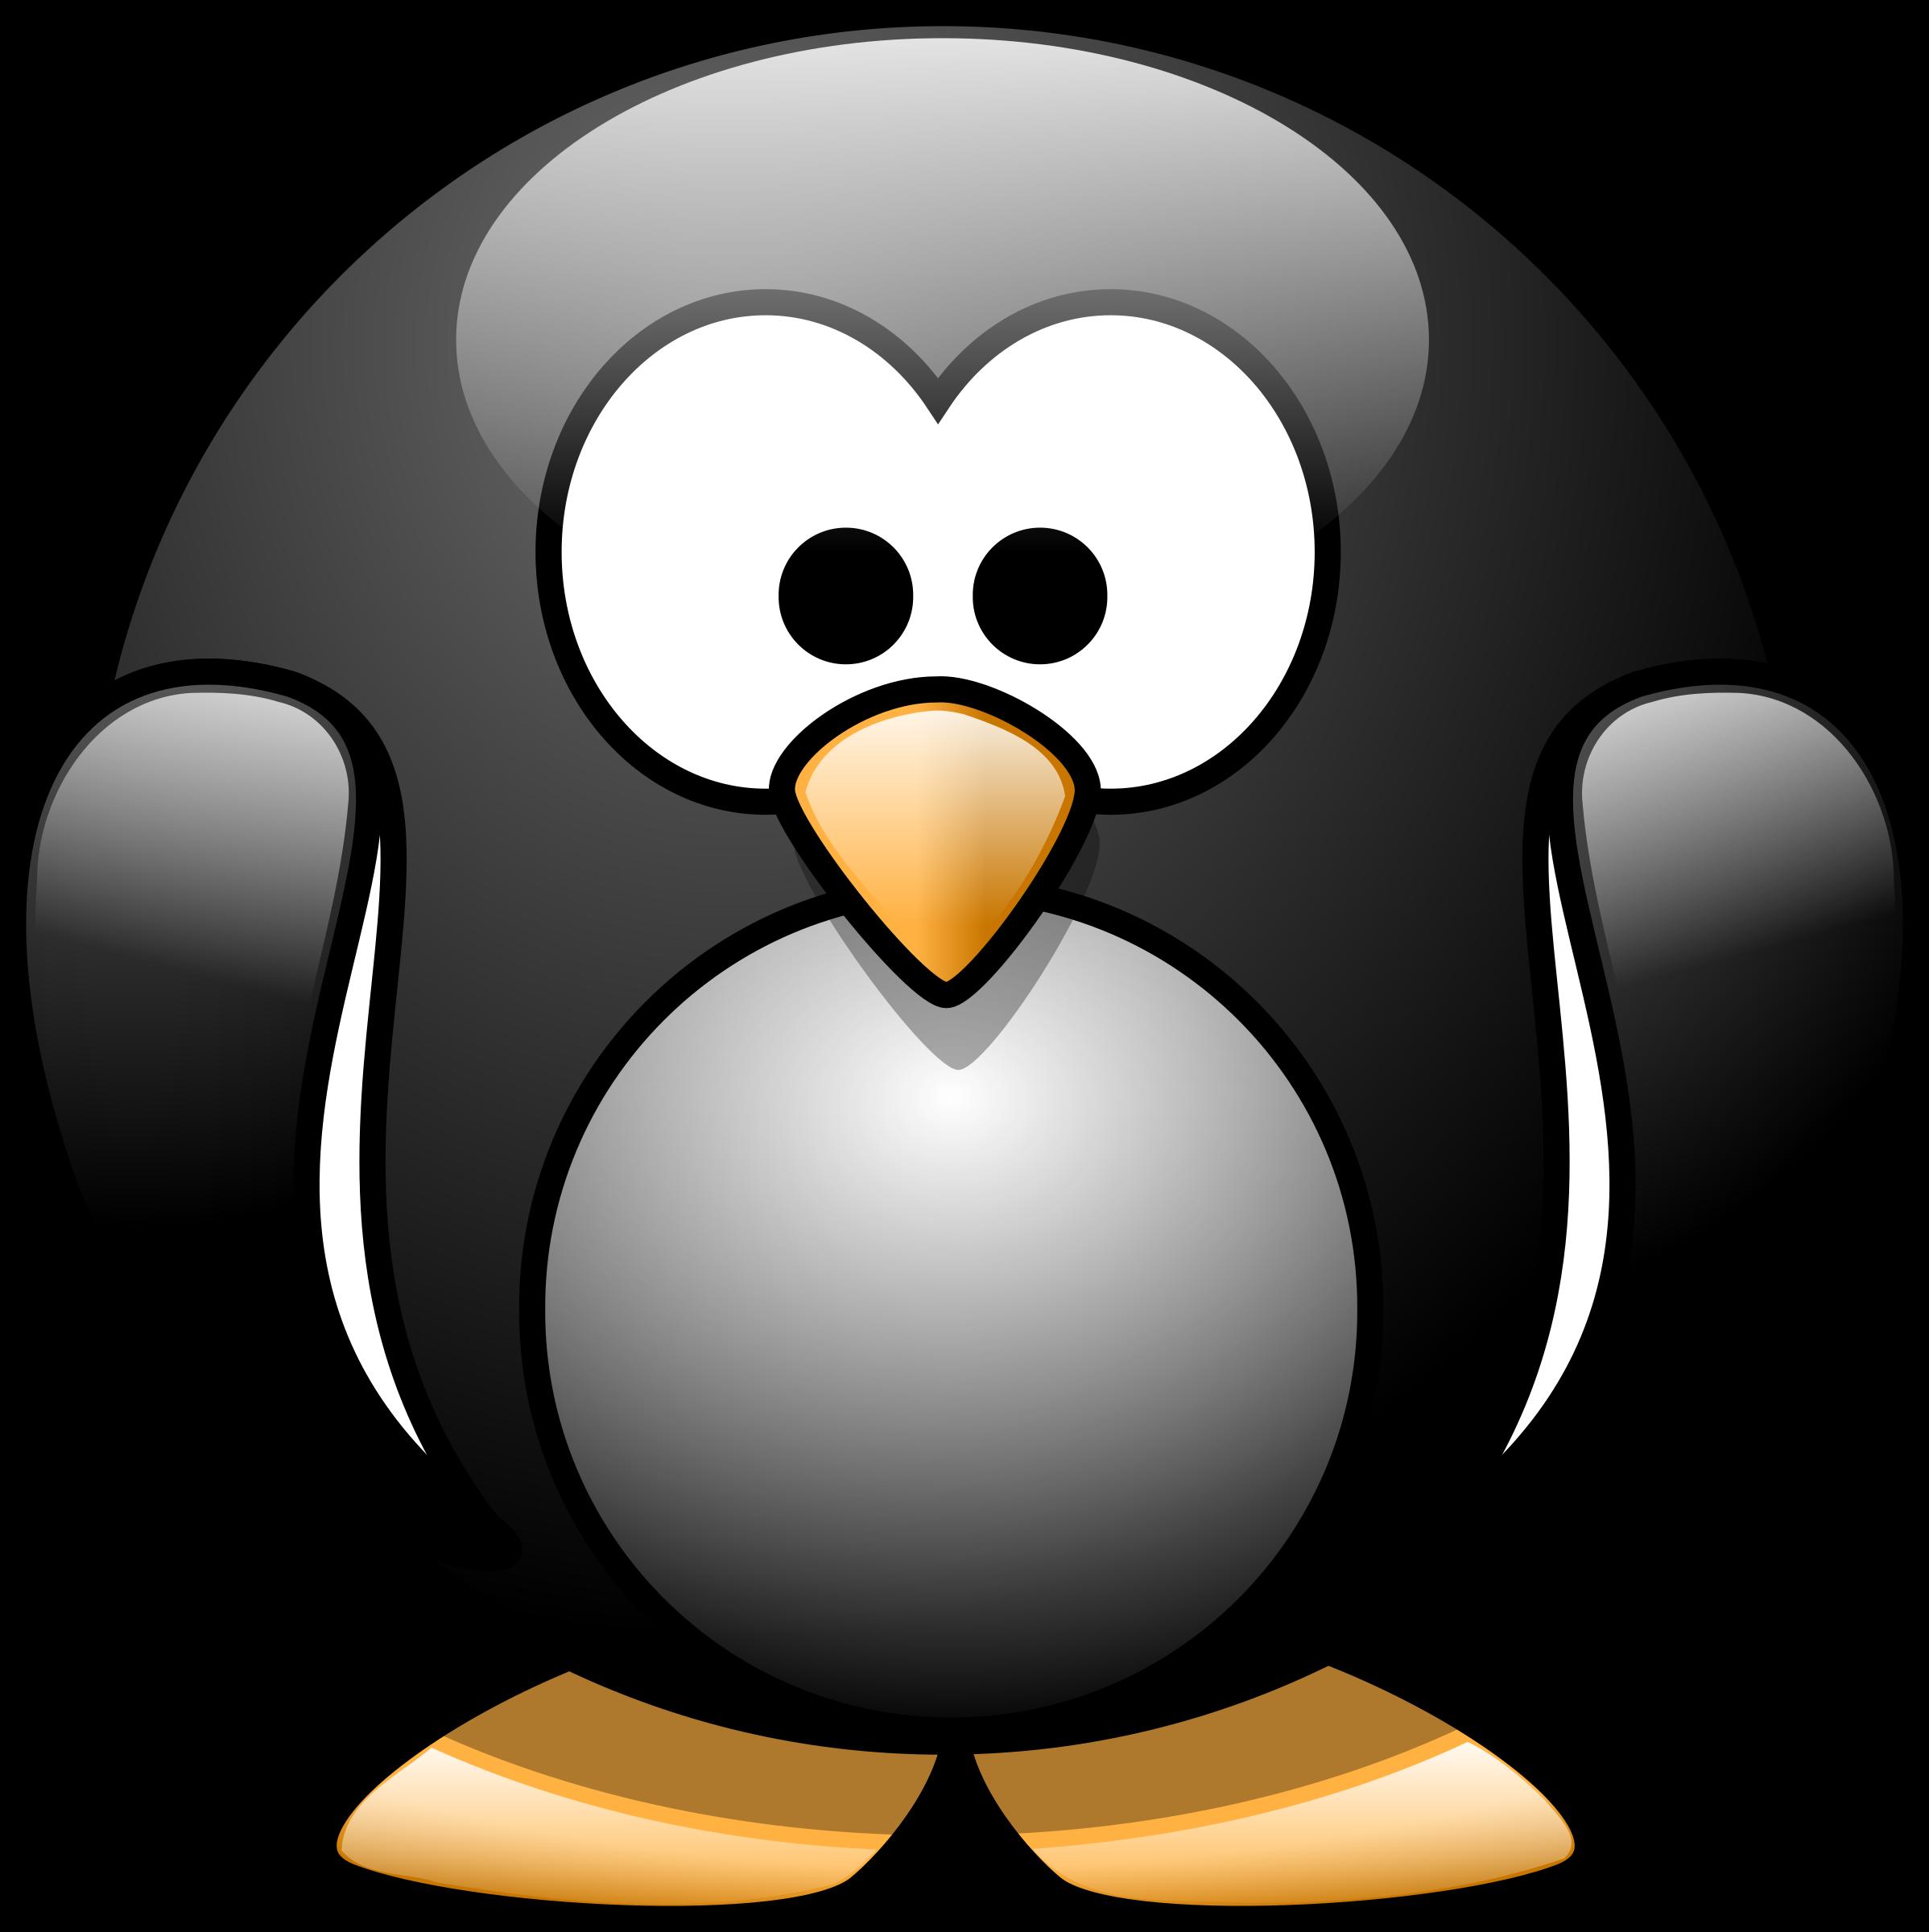 Number 1 clipart 1cartoon. Cartoon penguin big image